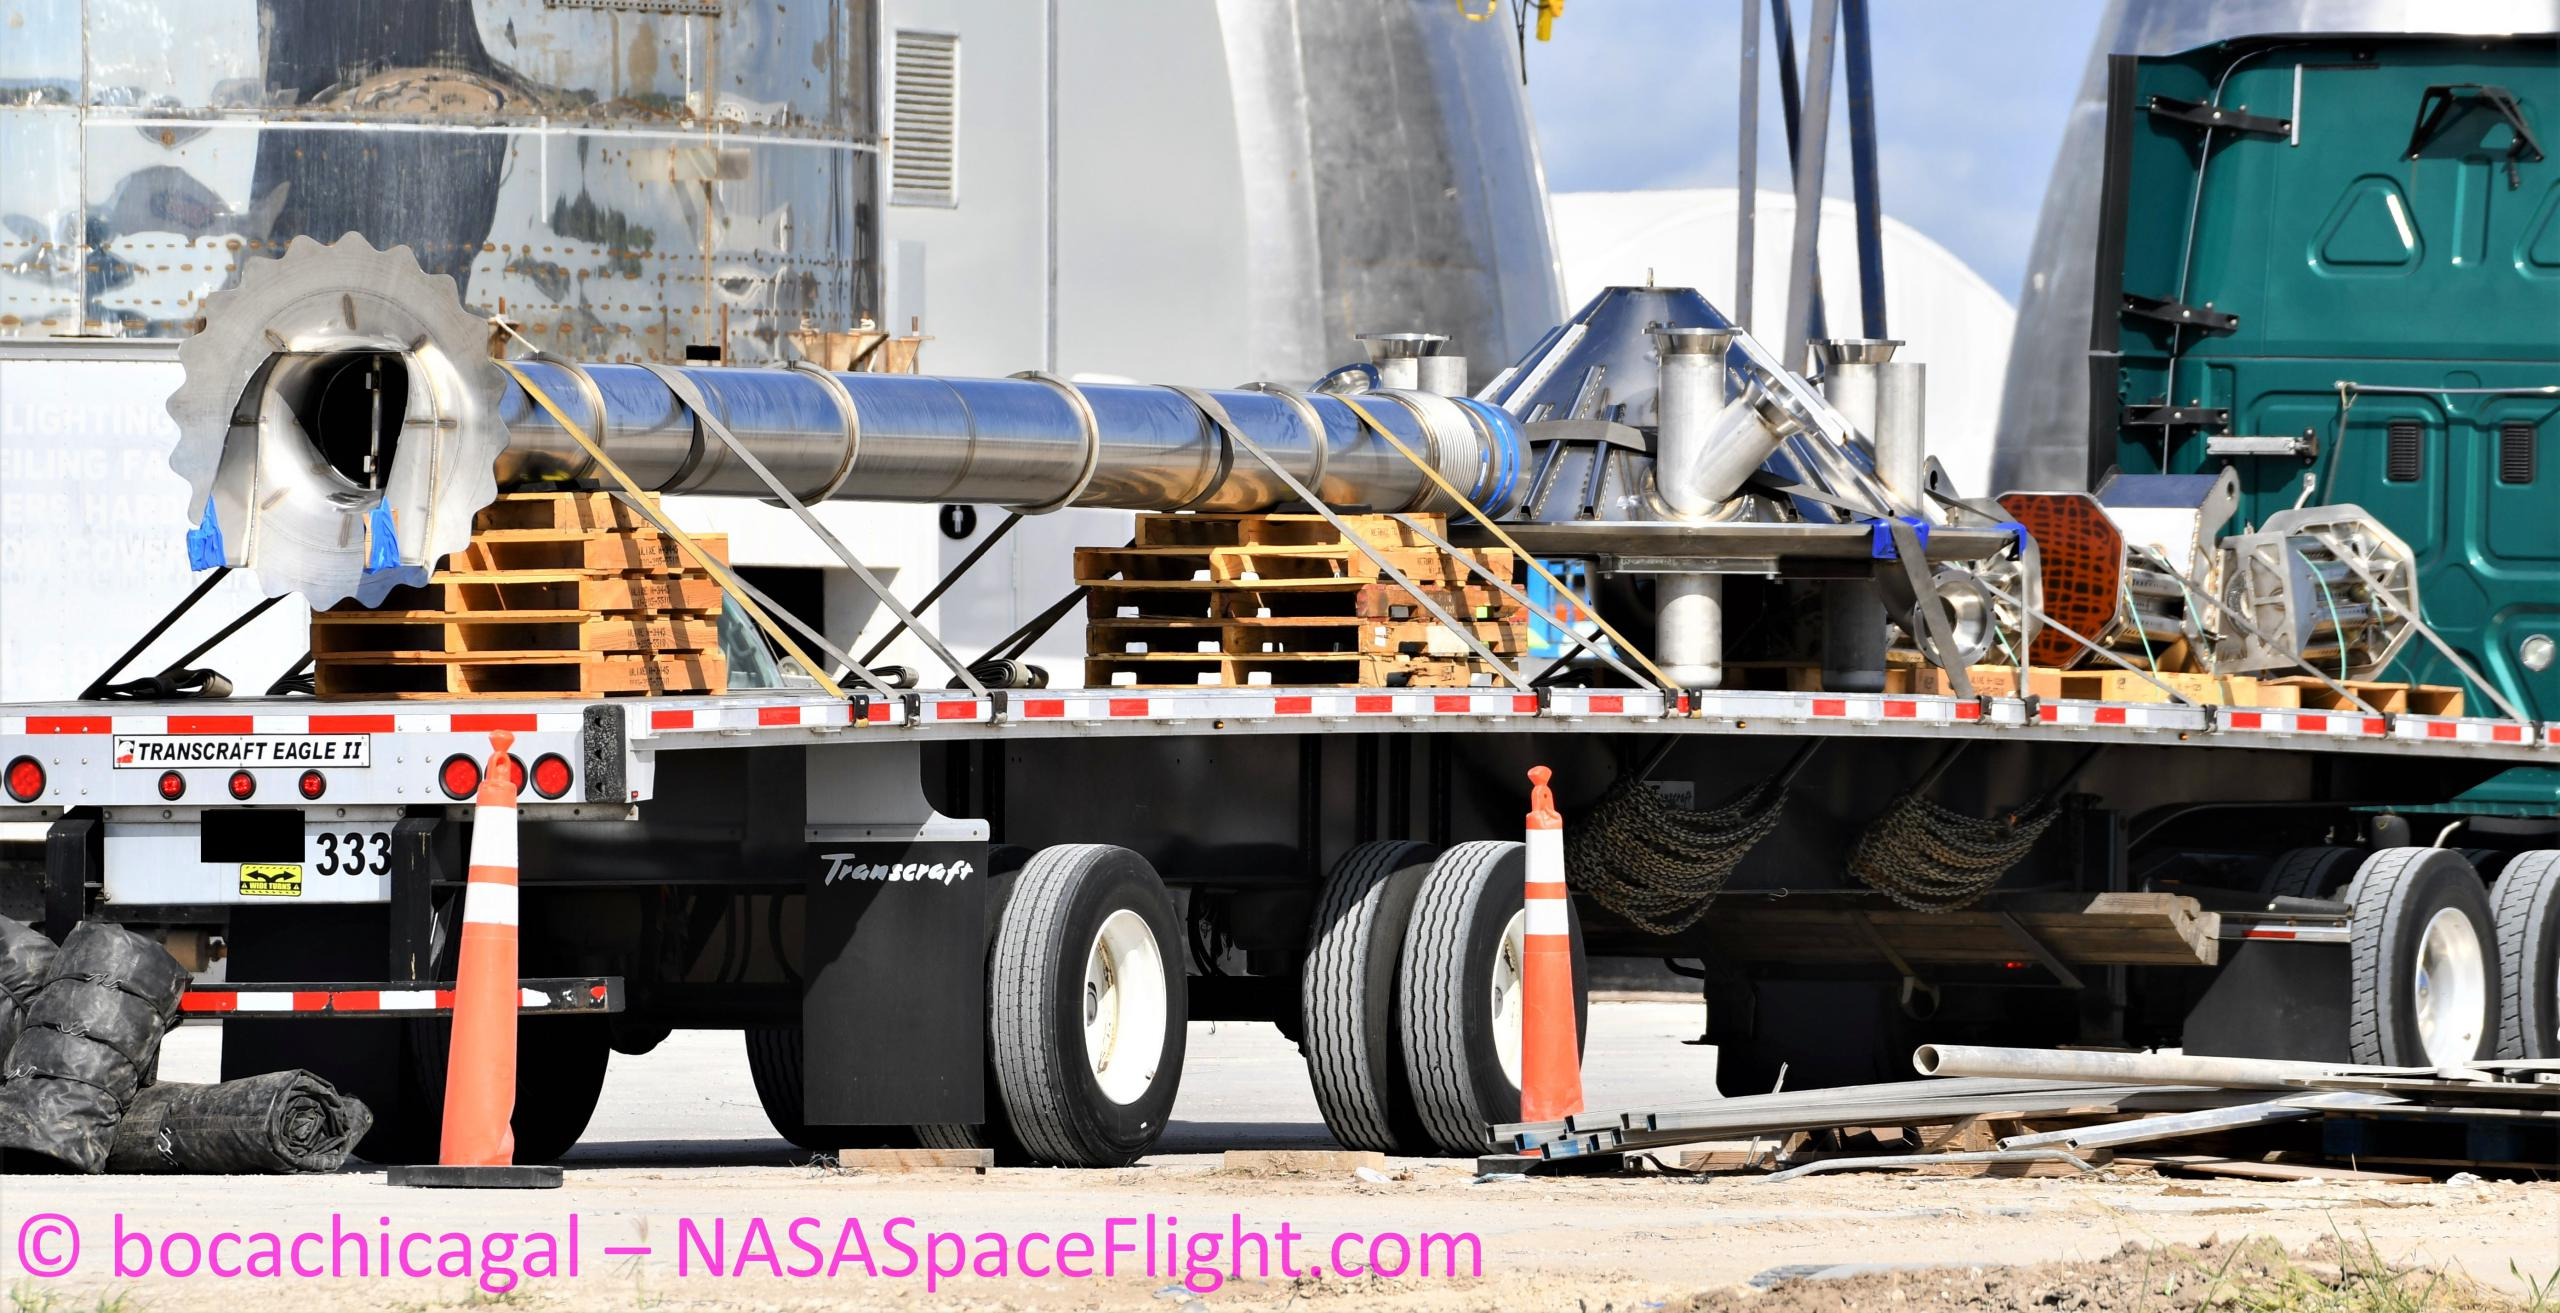 Starship Boca Chica 081720 (NASASpaceflight – bocachicagal) transfer tube thrust puck legs delivery 1 crop (c)